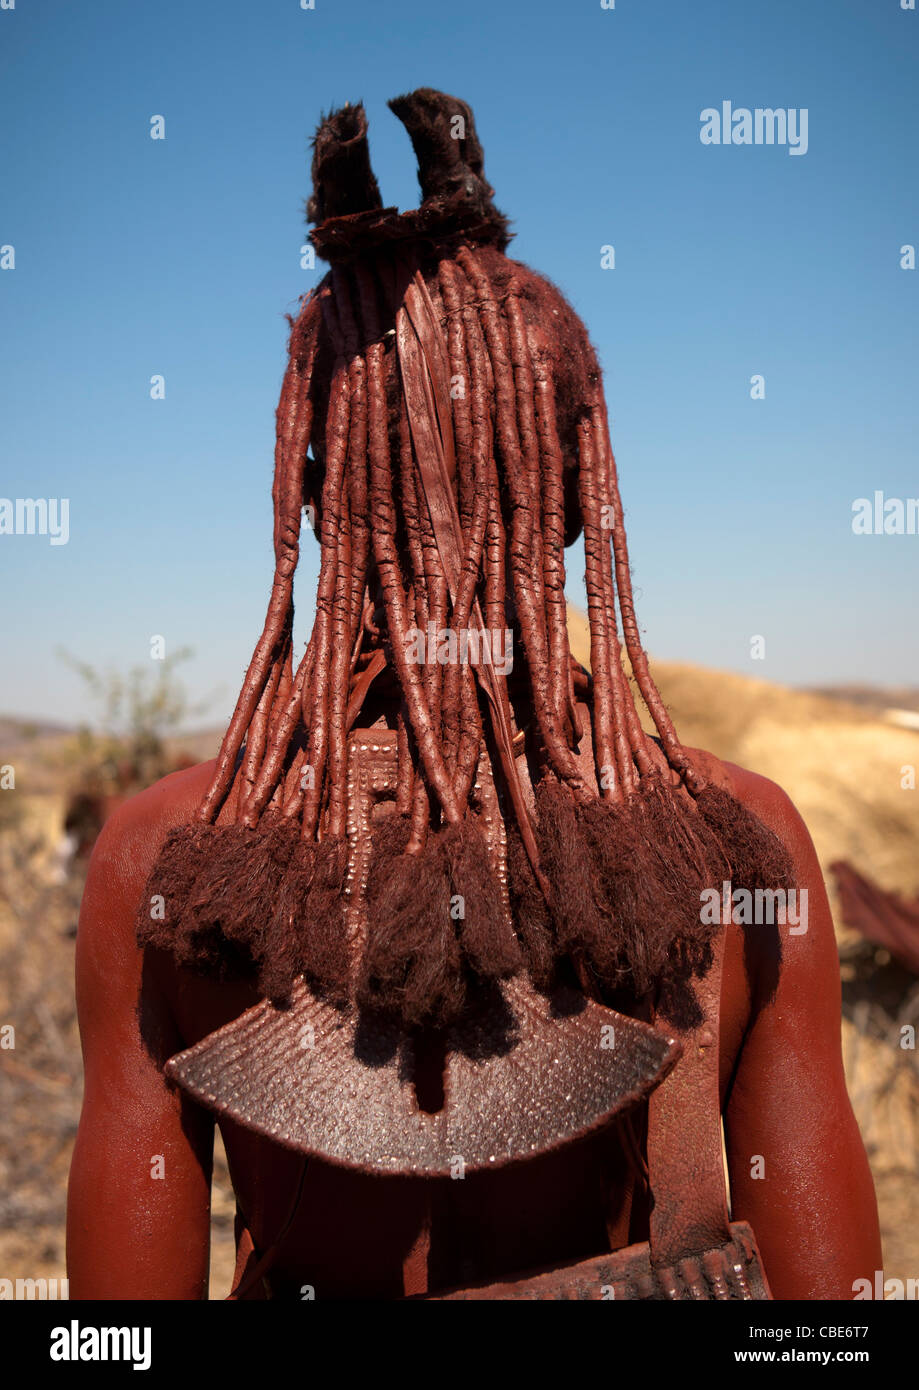 Muhimba Woman, Village Of Elola, Angola - Stock Image